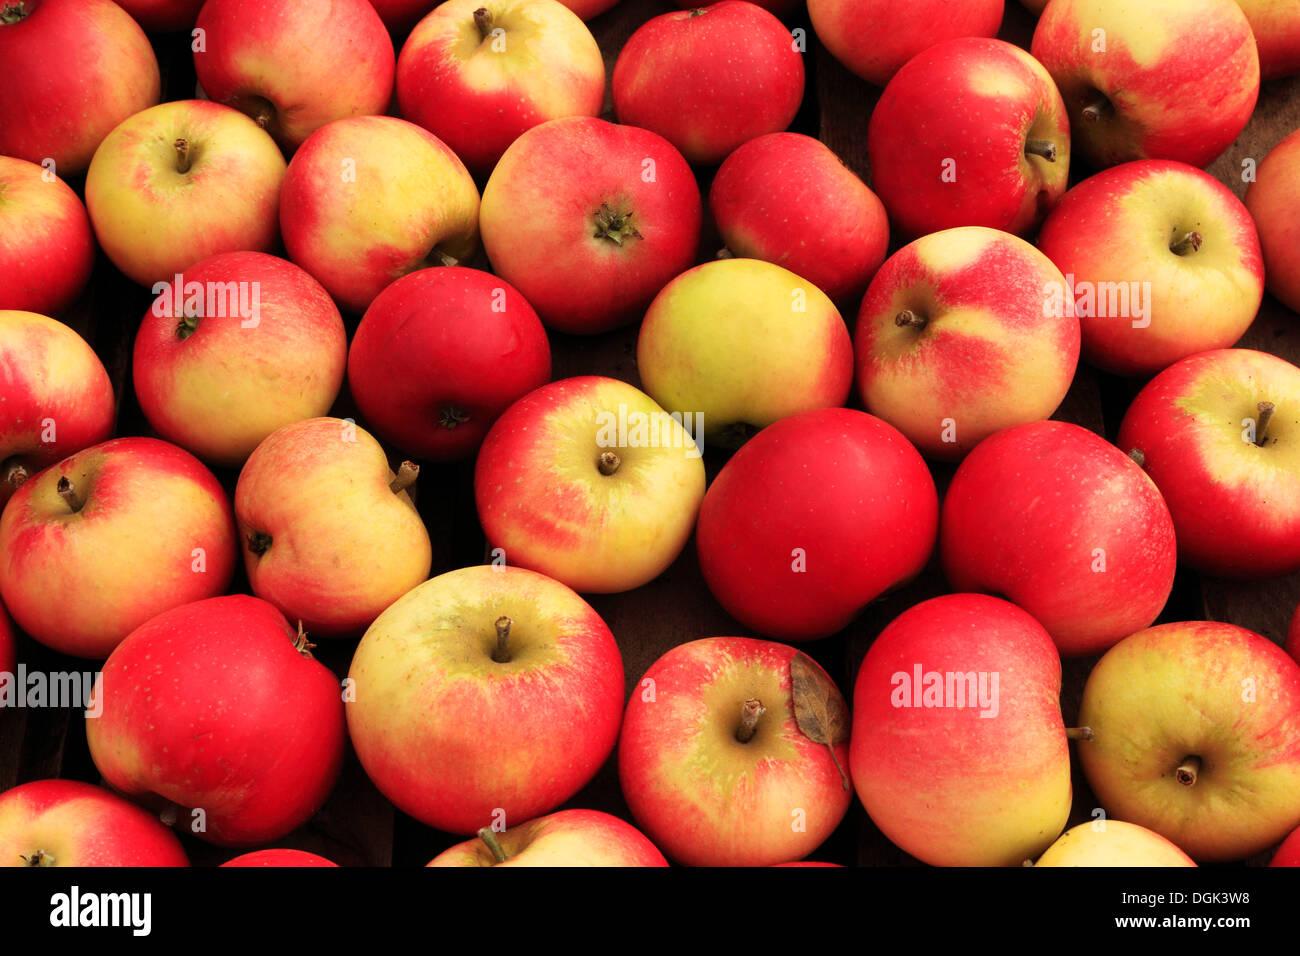 Apfel 'Entdeckung', Malus Domestica, anzeigen Äpfel verschiedene Sorten im Hofladen Stockbild